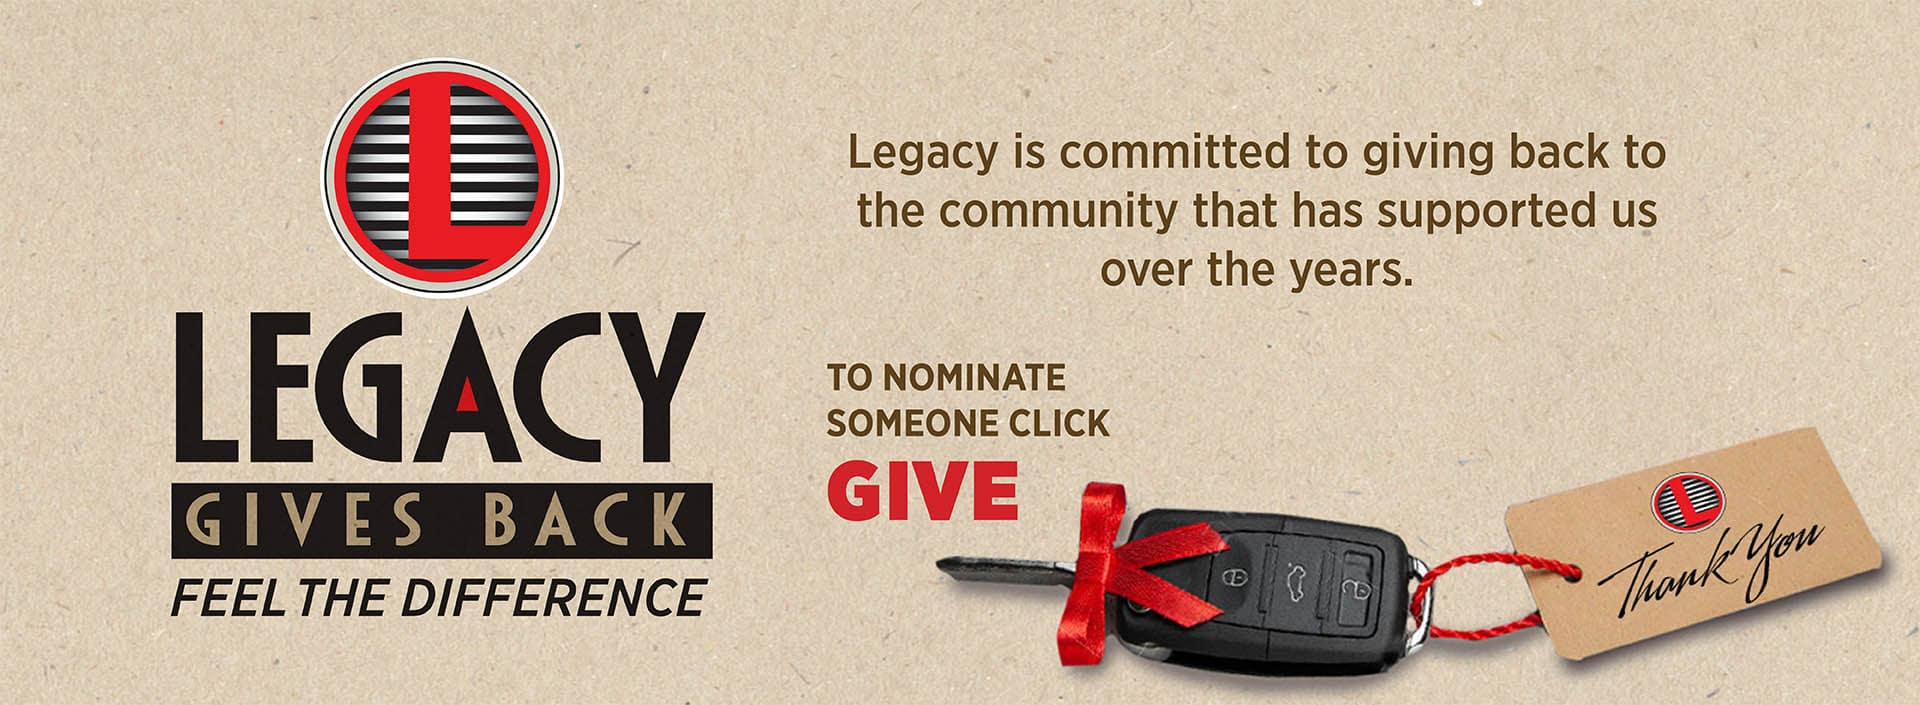 Legacy Gives Back in Garden City, KS